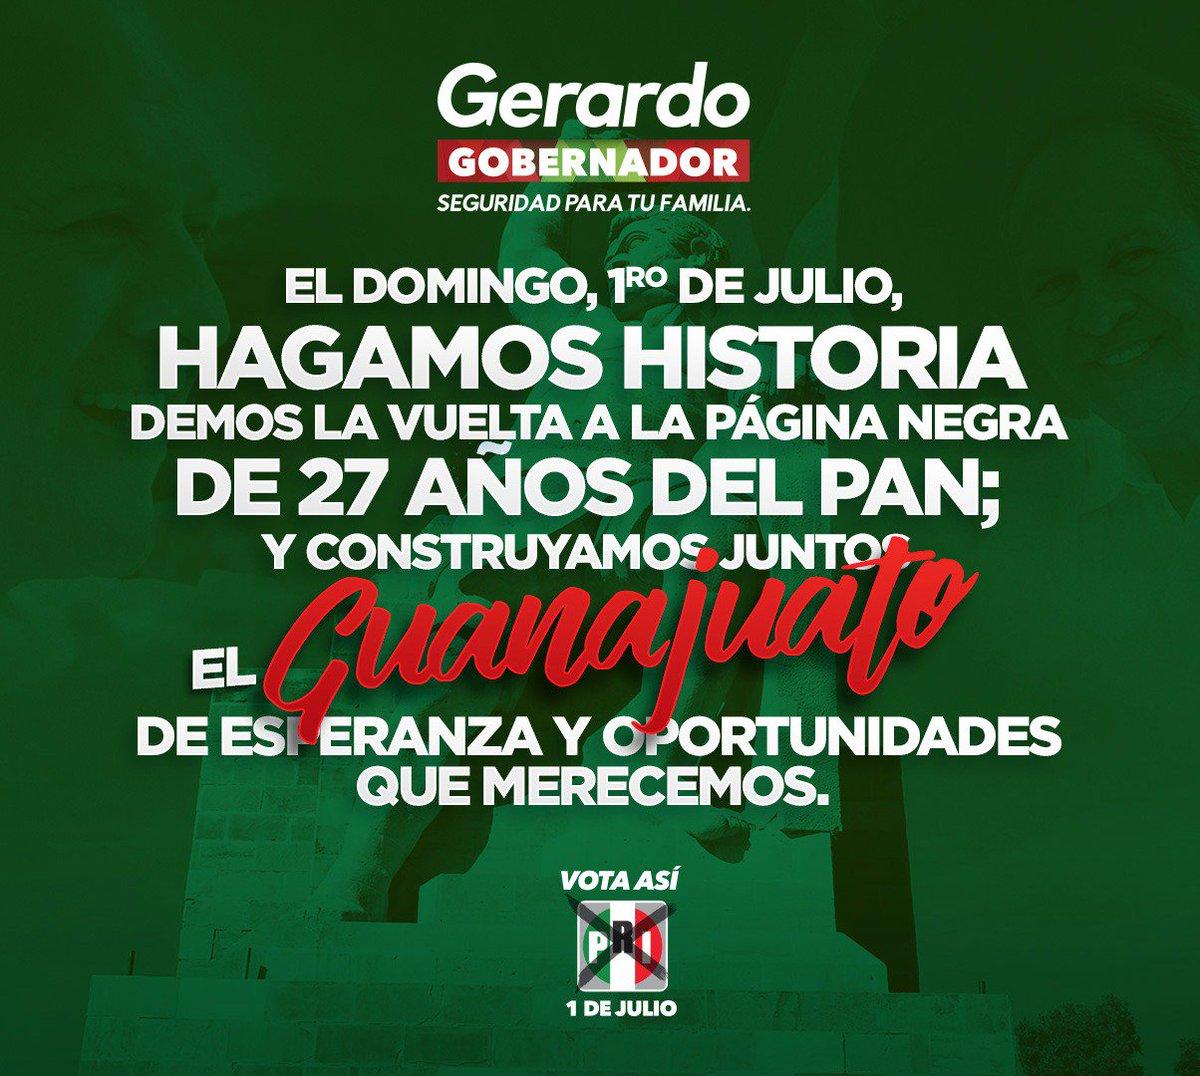 Gerardo_Sanchz_ photo